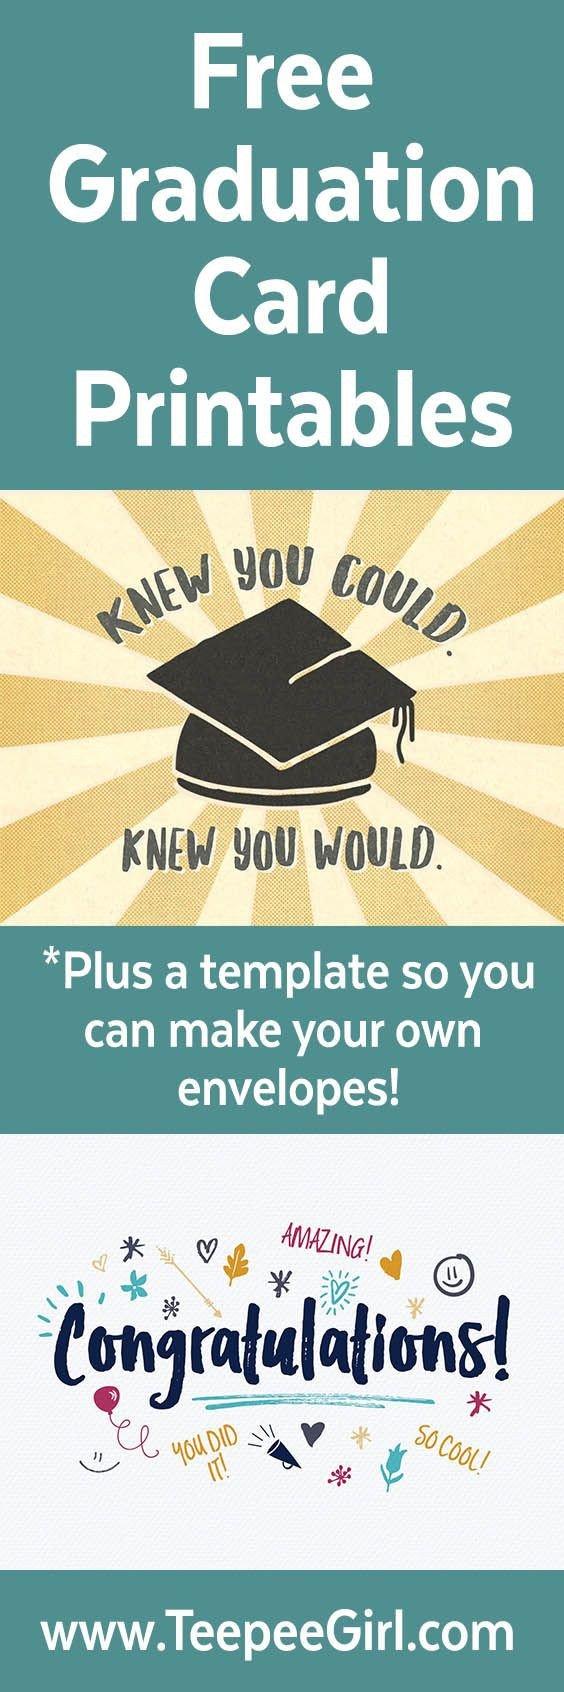 Congratulations Graduation Card Template Free Graduation Congratulations Cards with Envelope